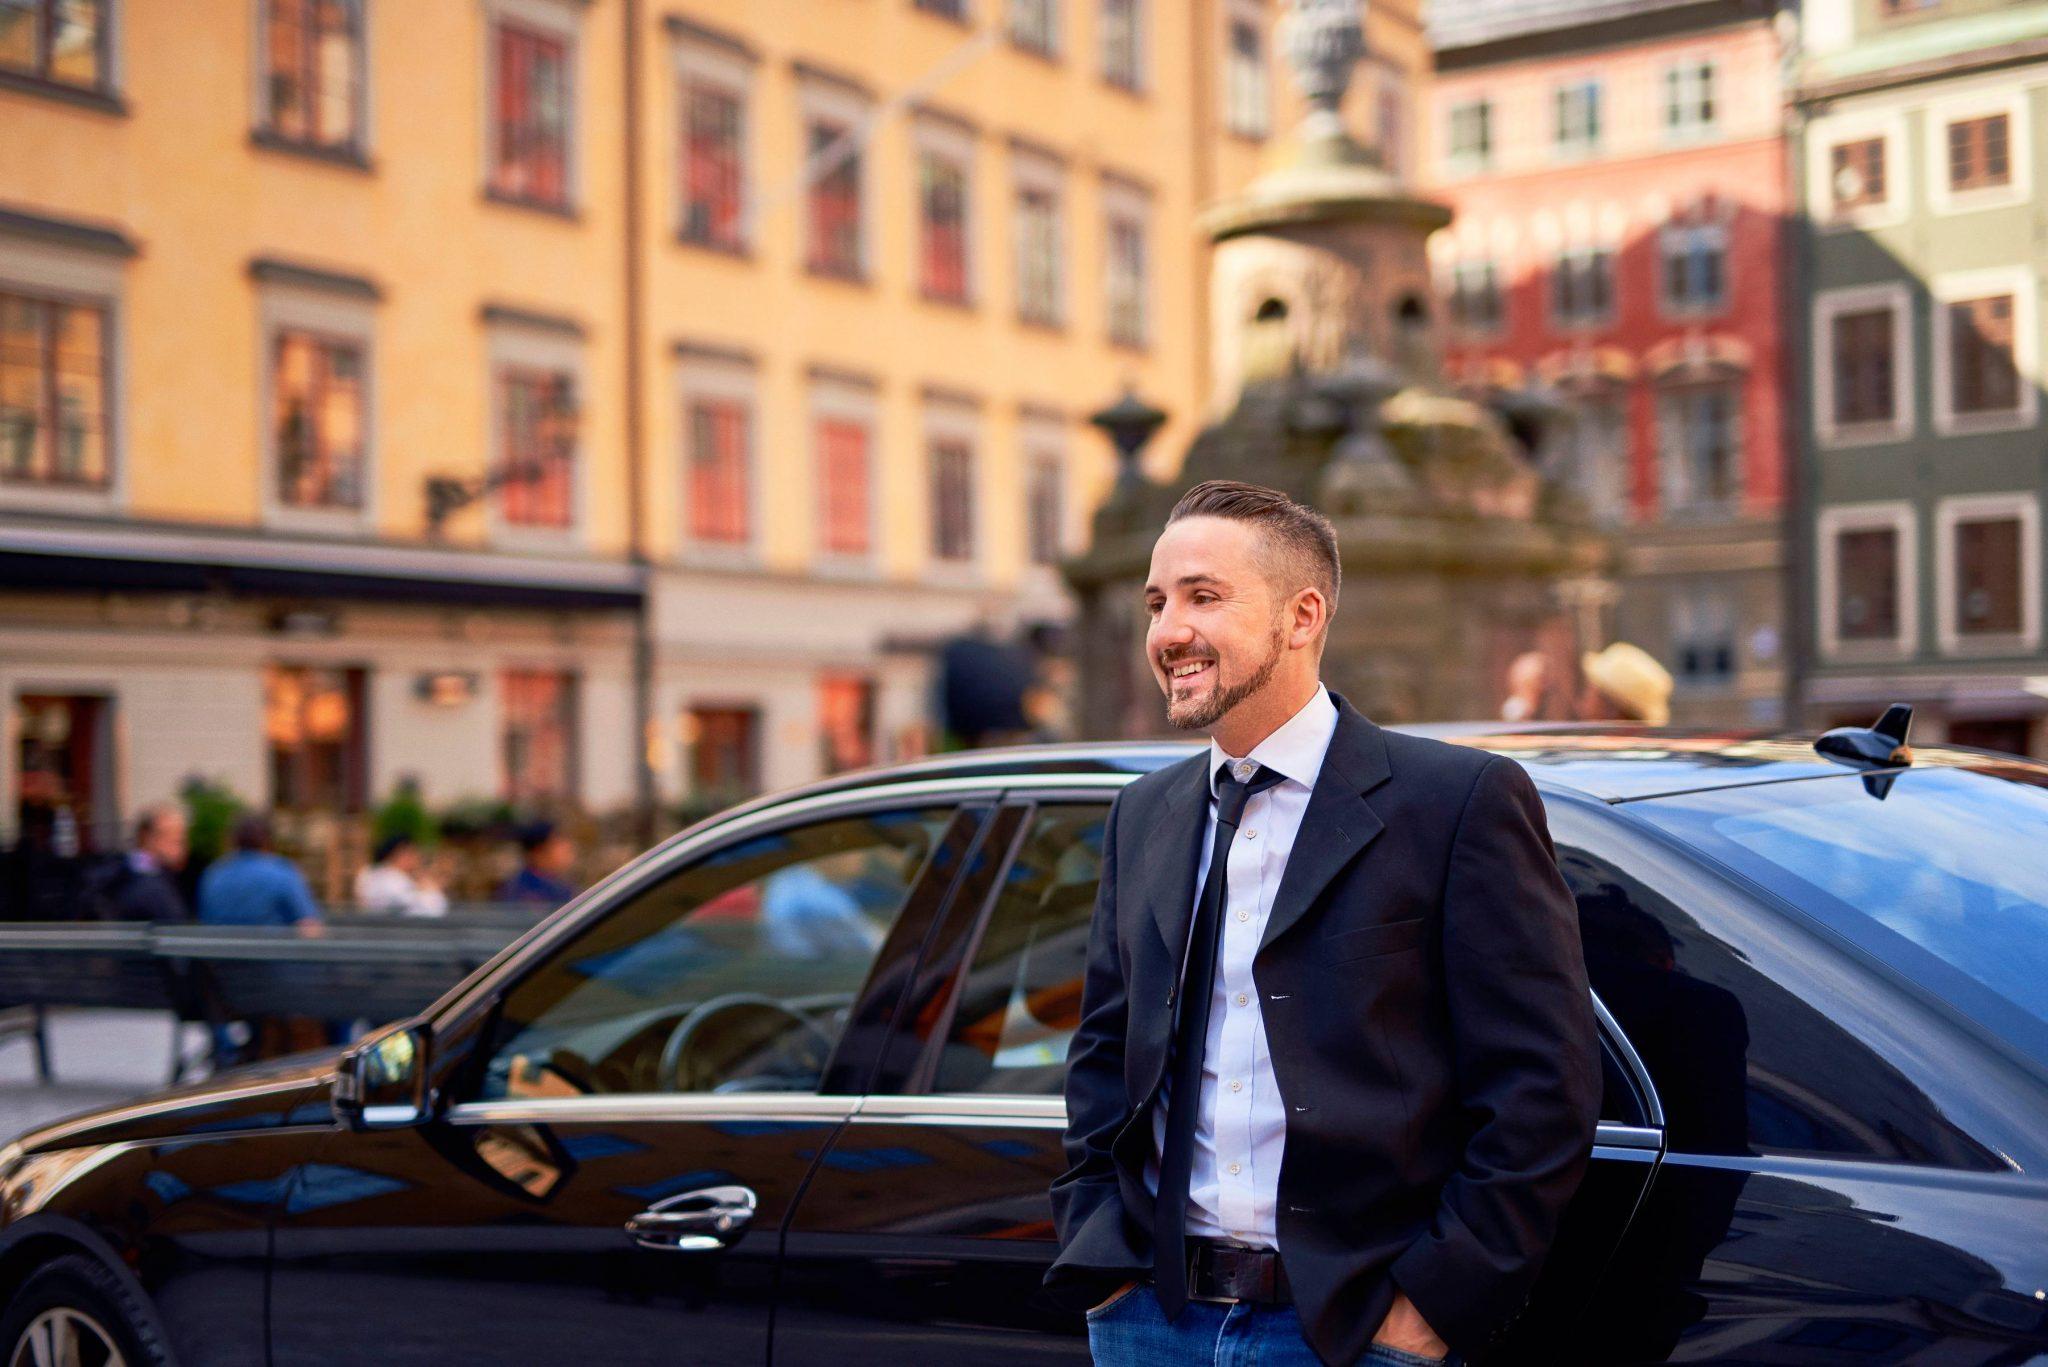 Uber mobilità urbana